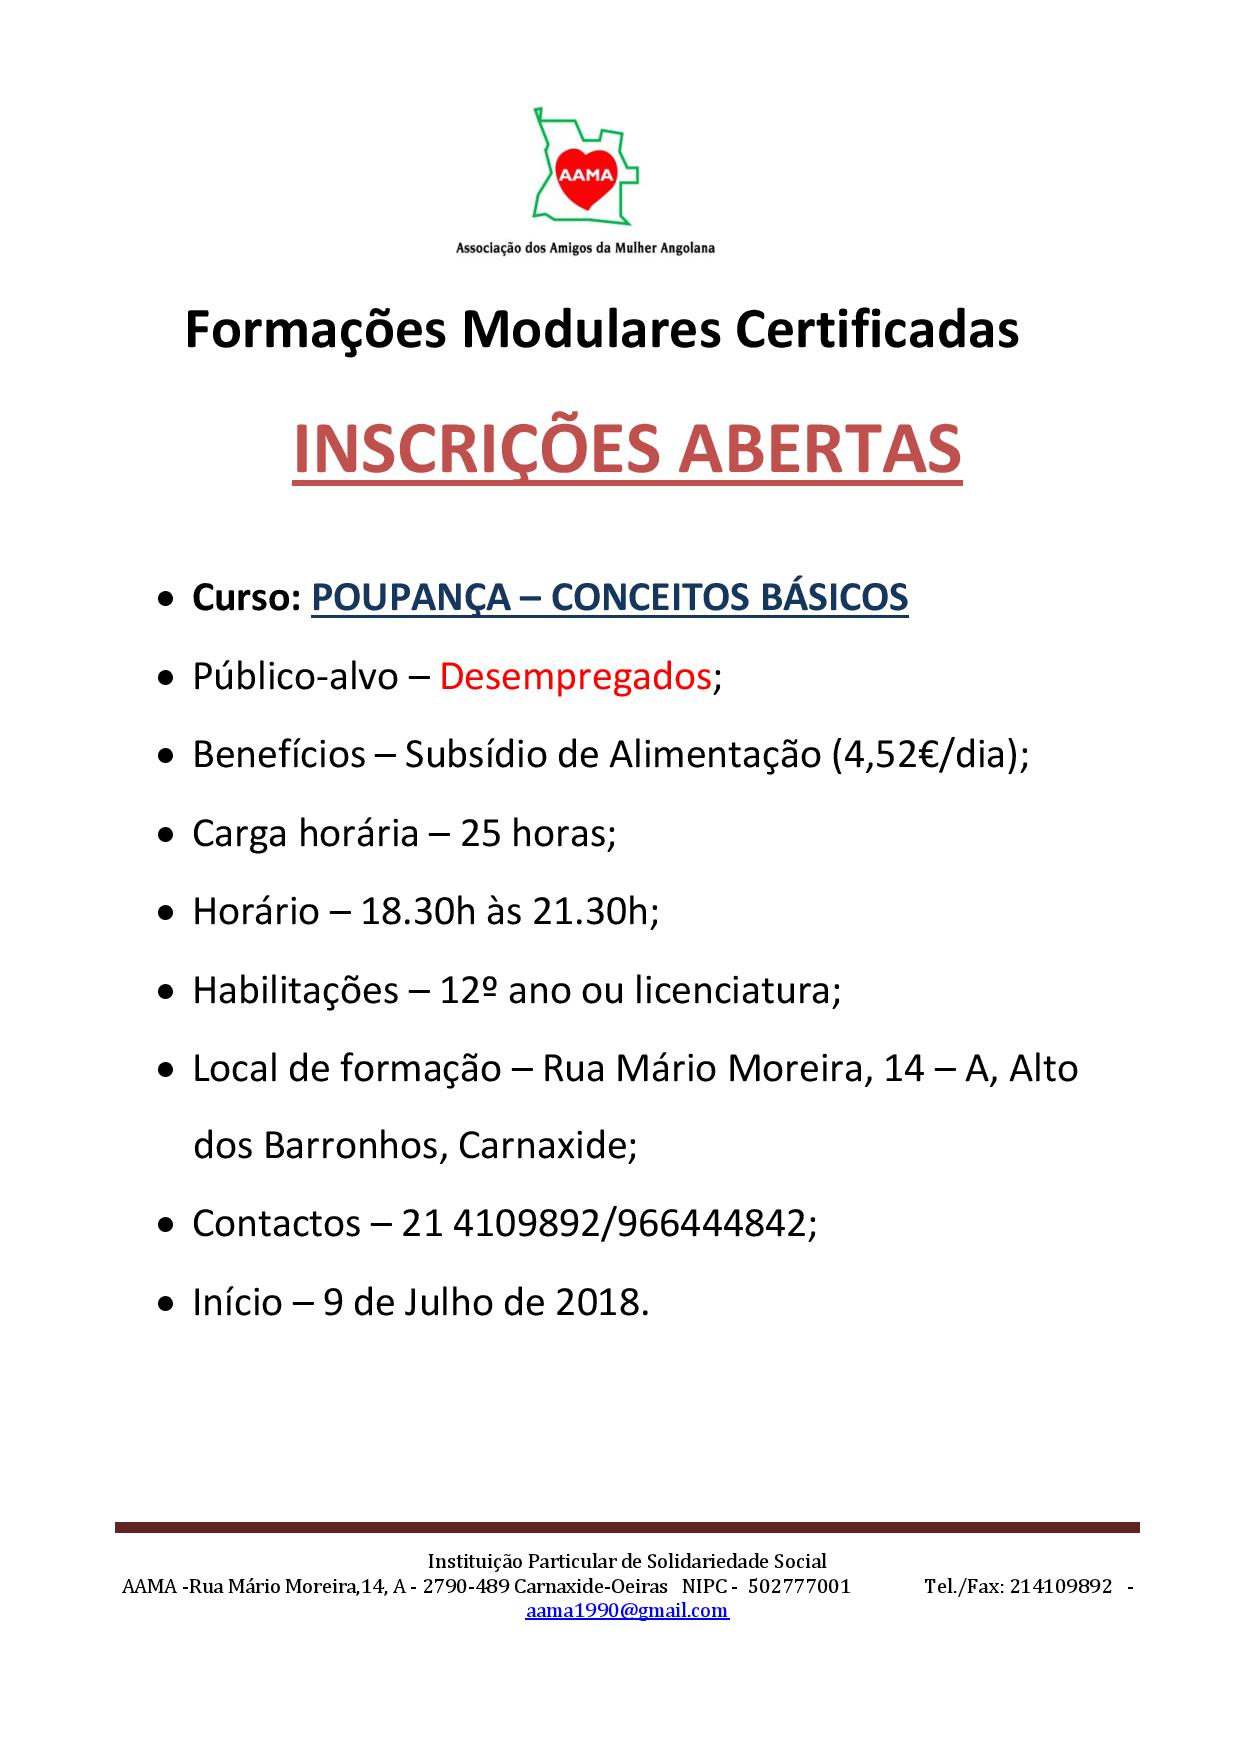 You are currently viewing Formações Modulares Certificadas